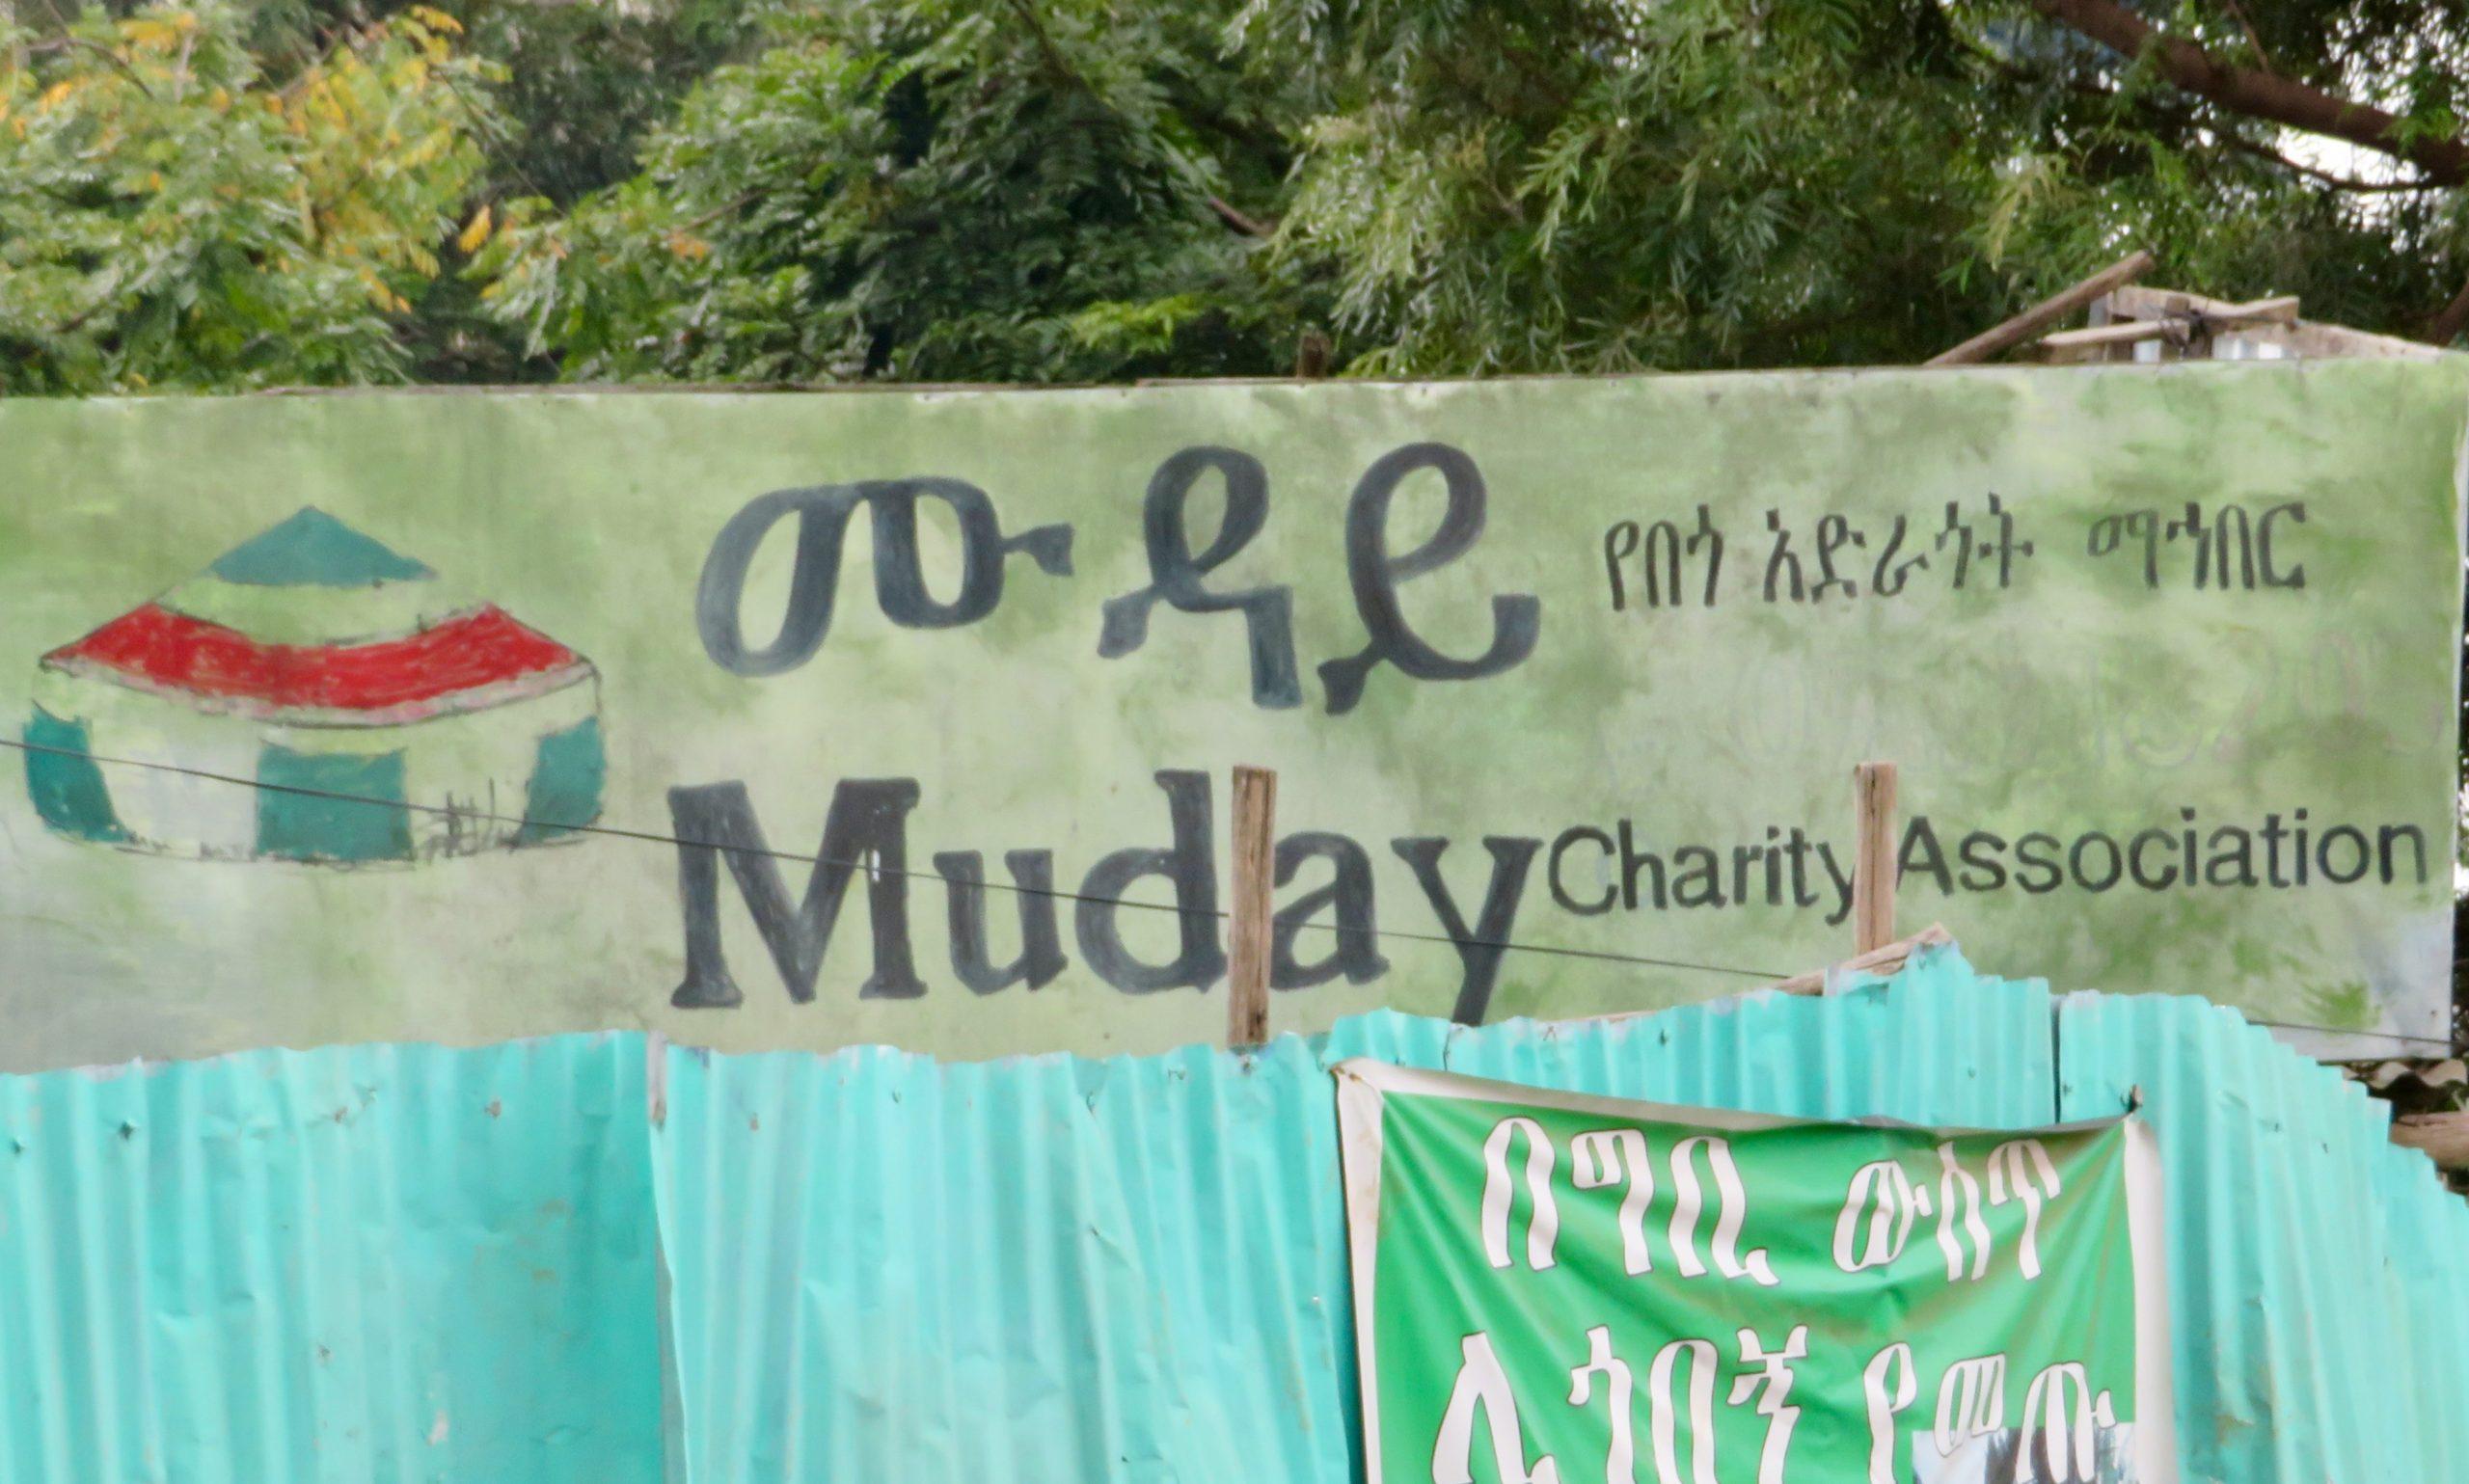 Muday Charity Association